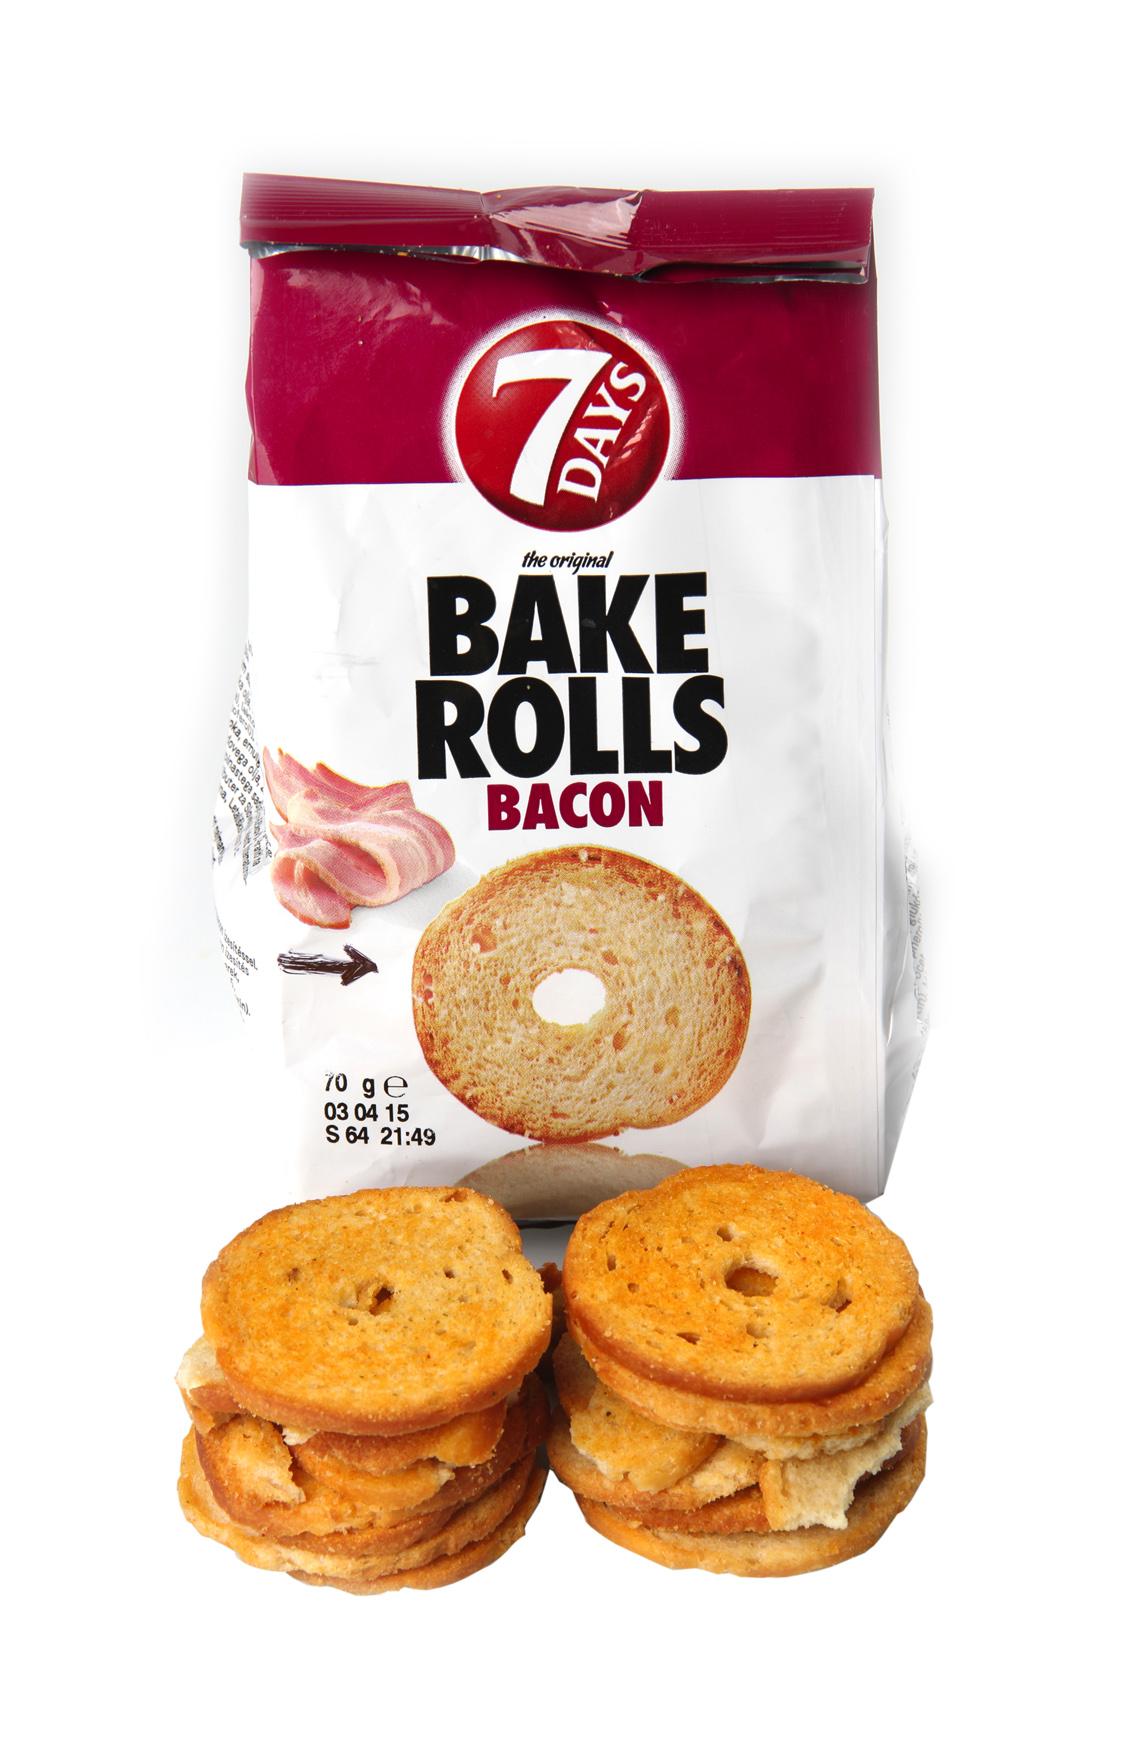 7 Days, Bake Rolls Bacon